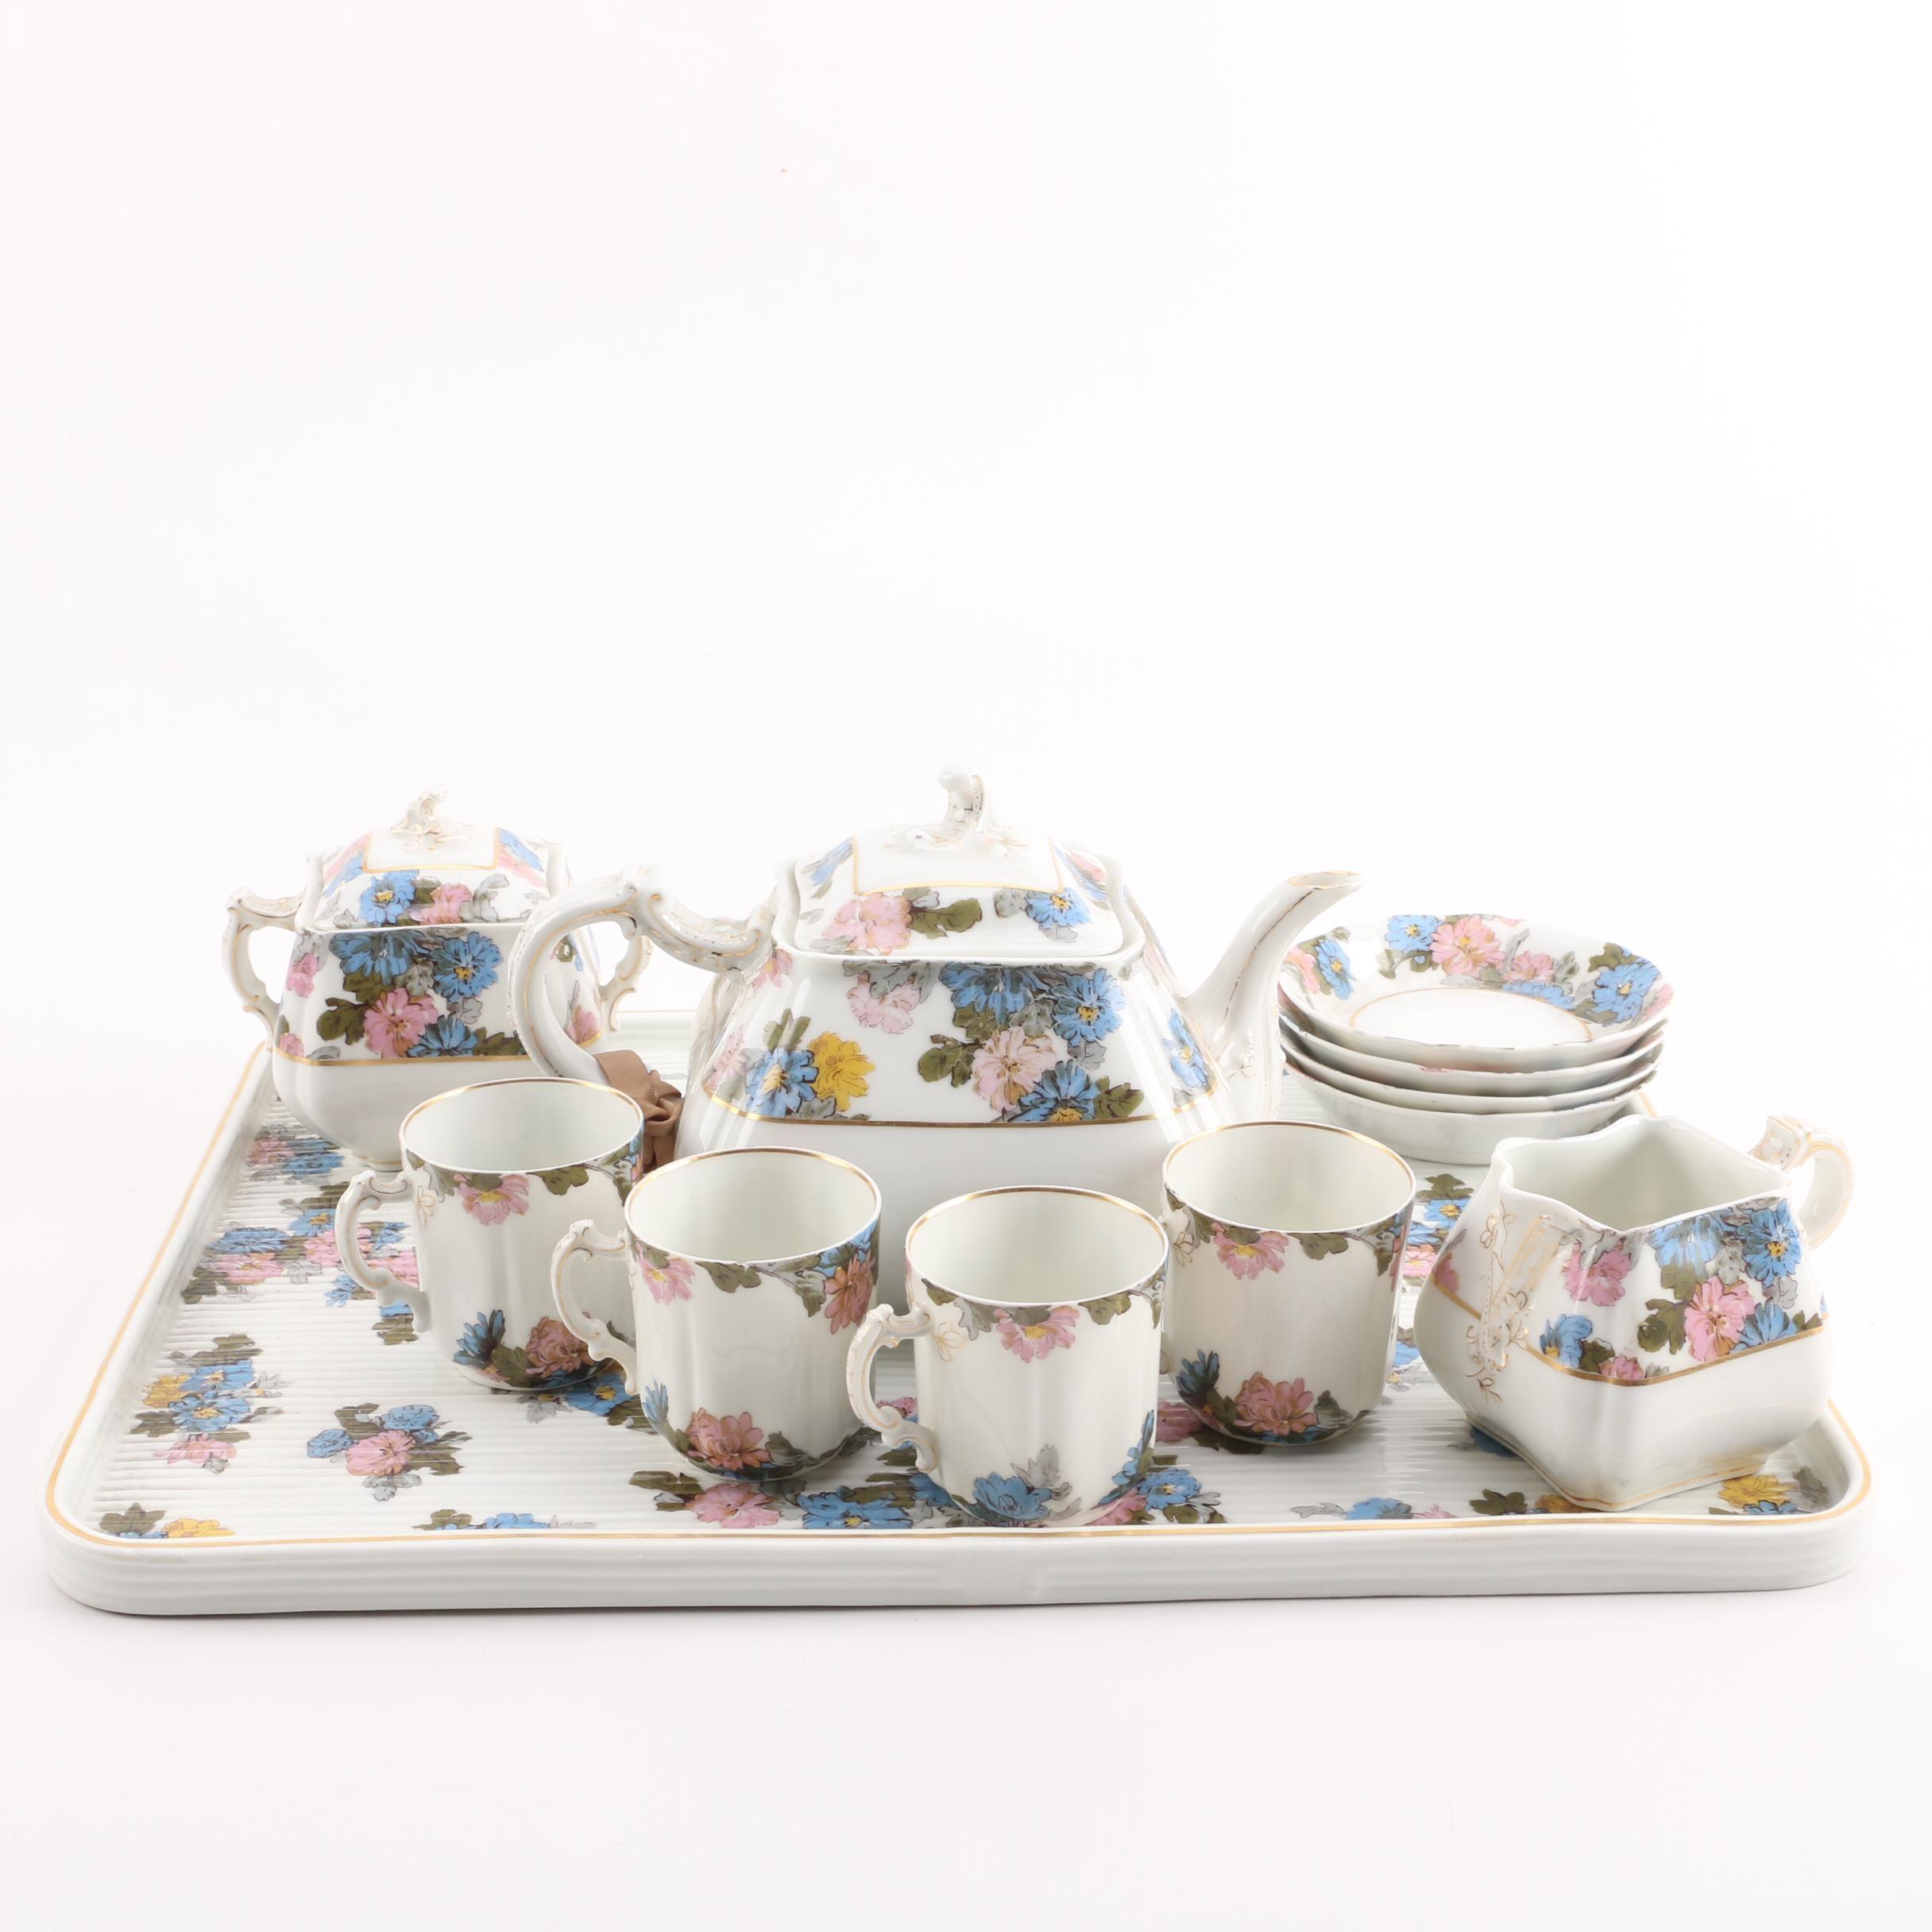 Antique  Haviland Limoges Porcelain Tea Service